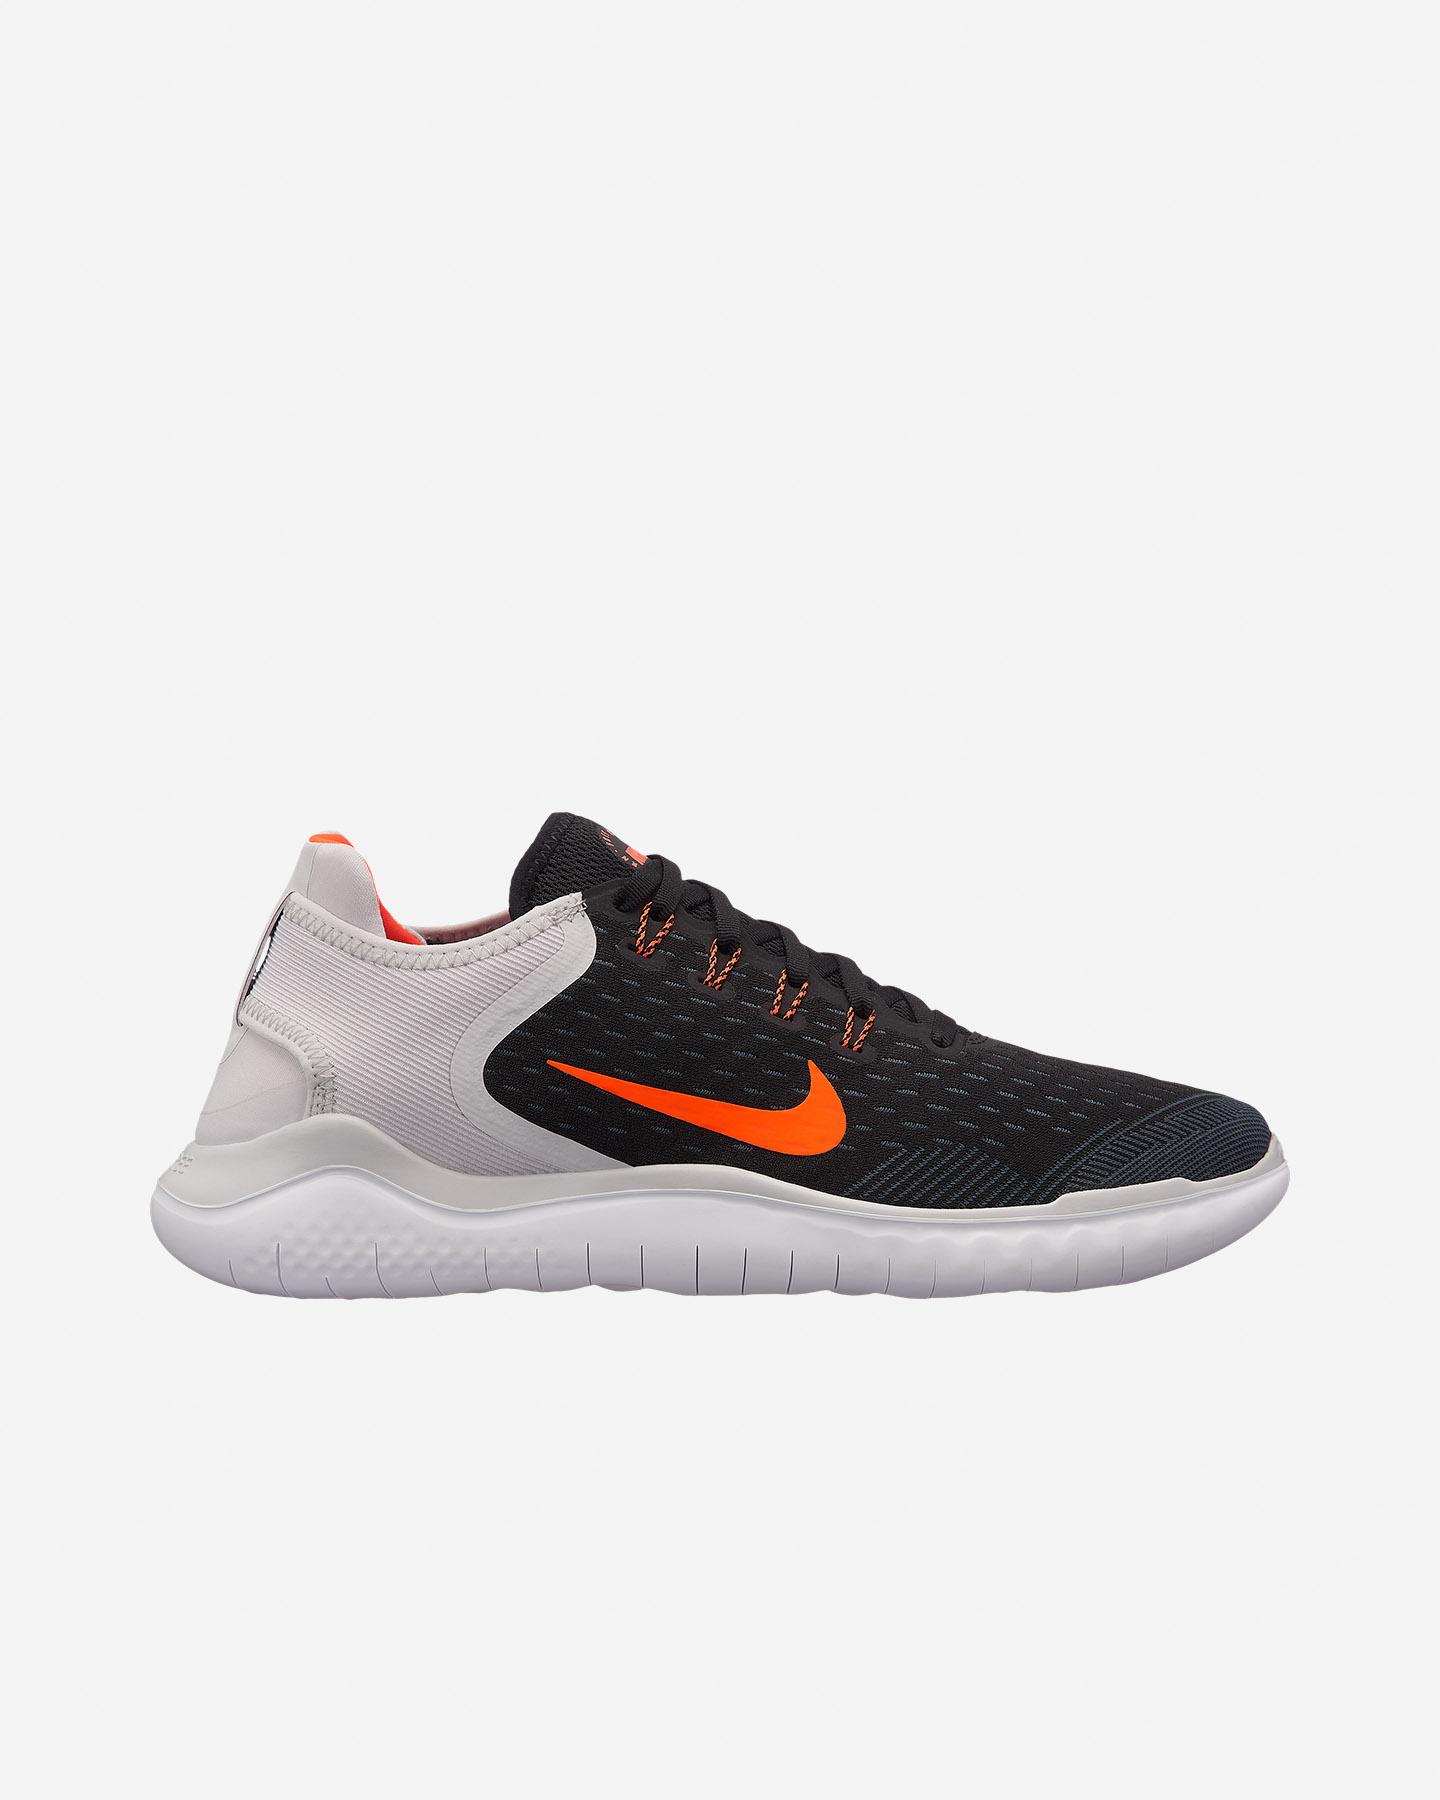 M 2018 942836 Cisalfa Sportive Scarpe 005 Free Sport Rn Su Nike EtwqBTI